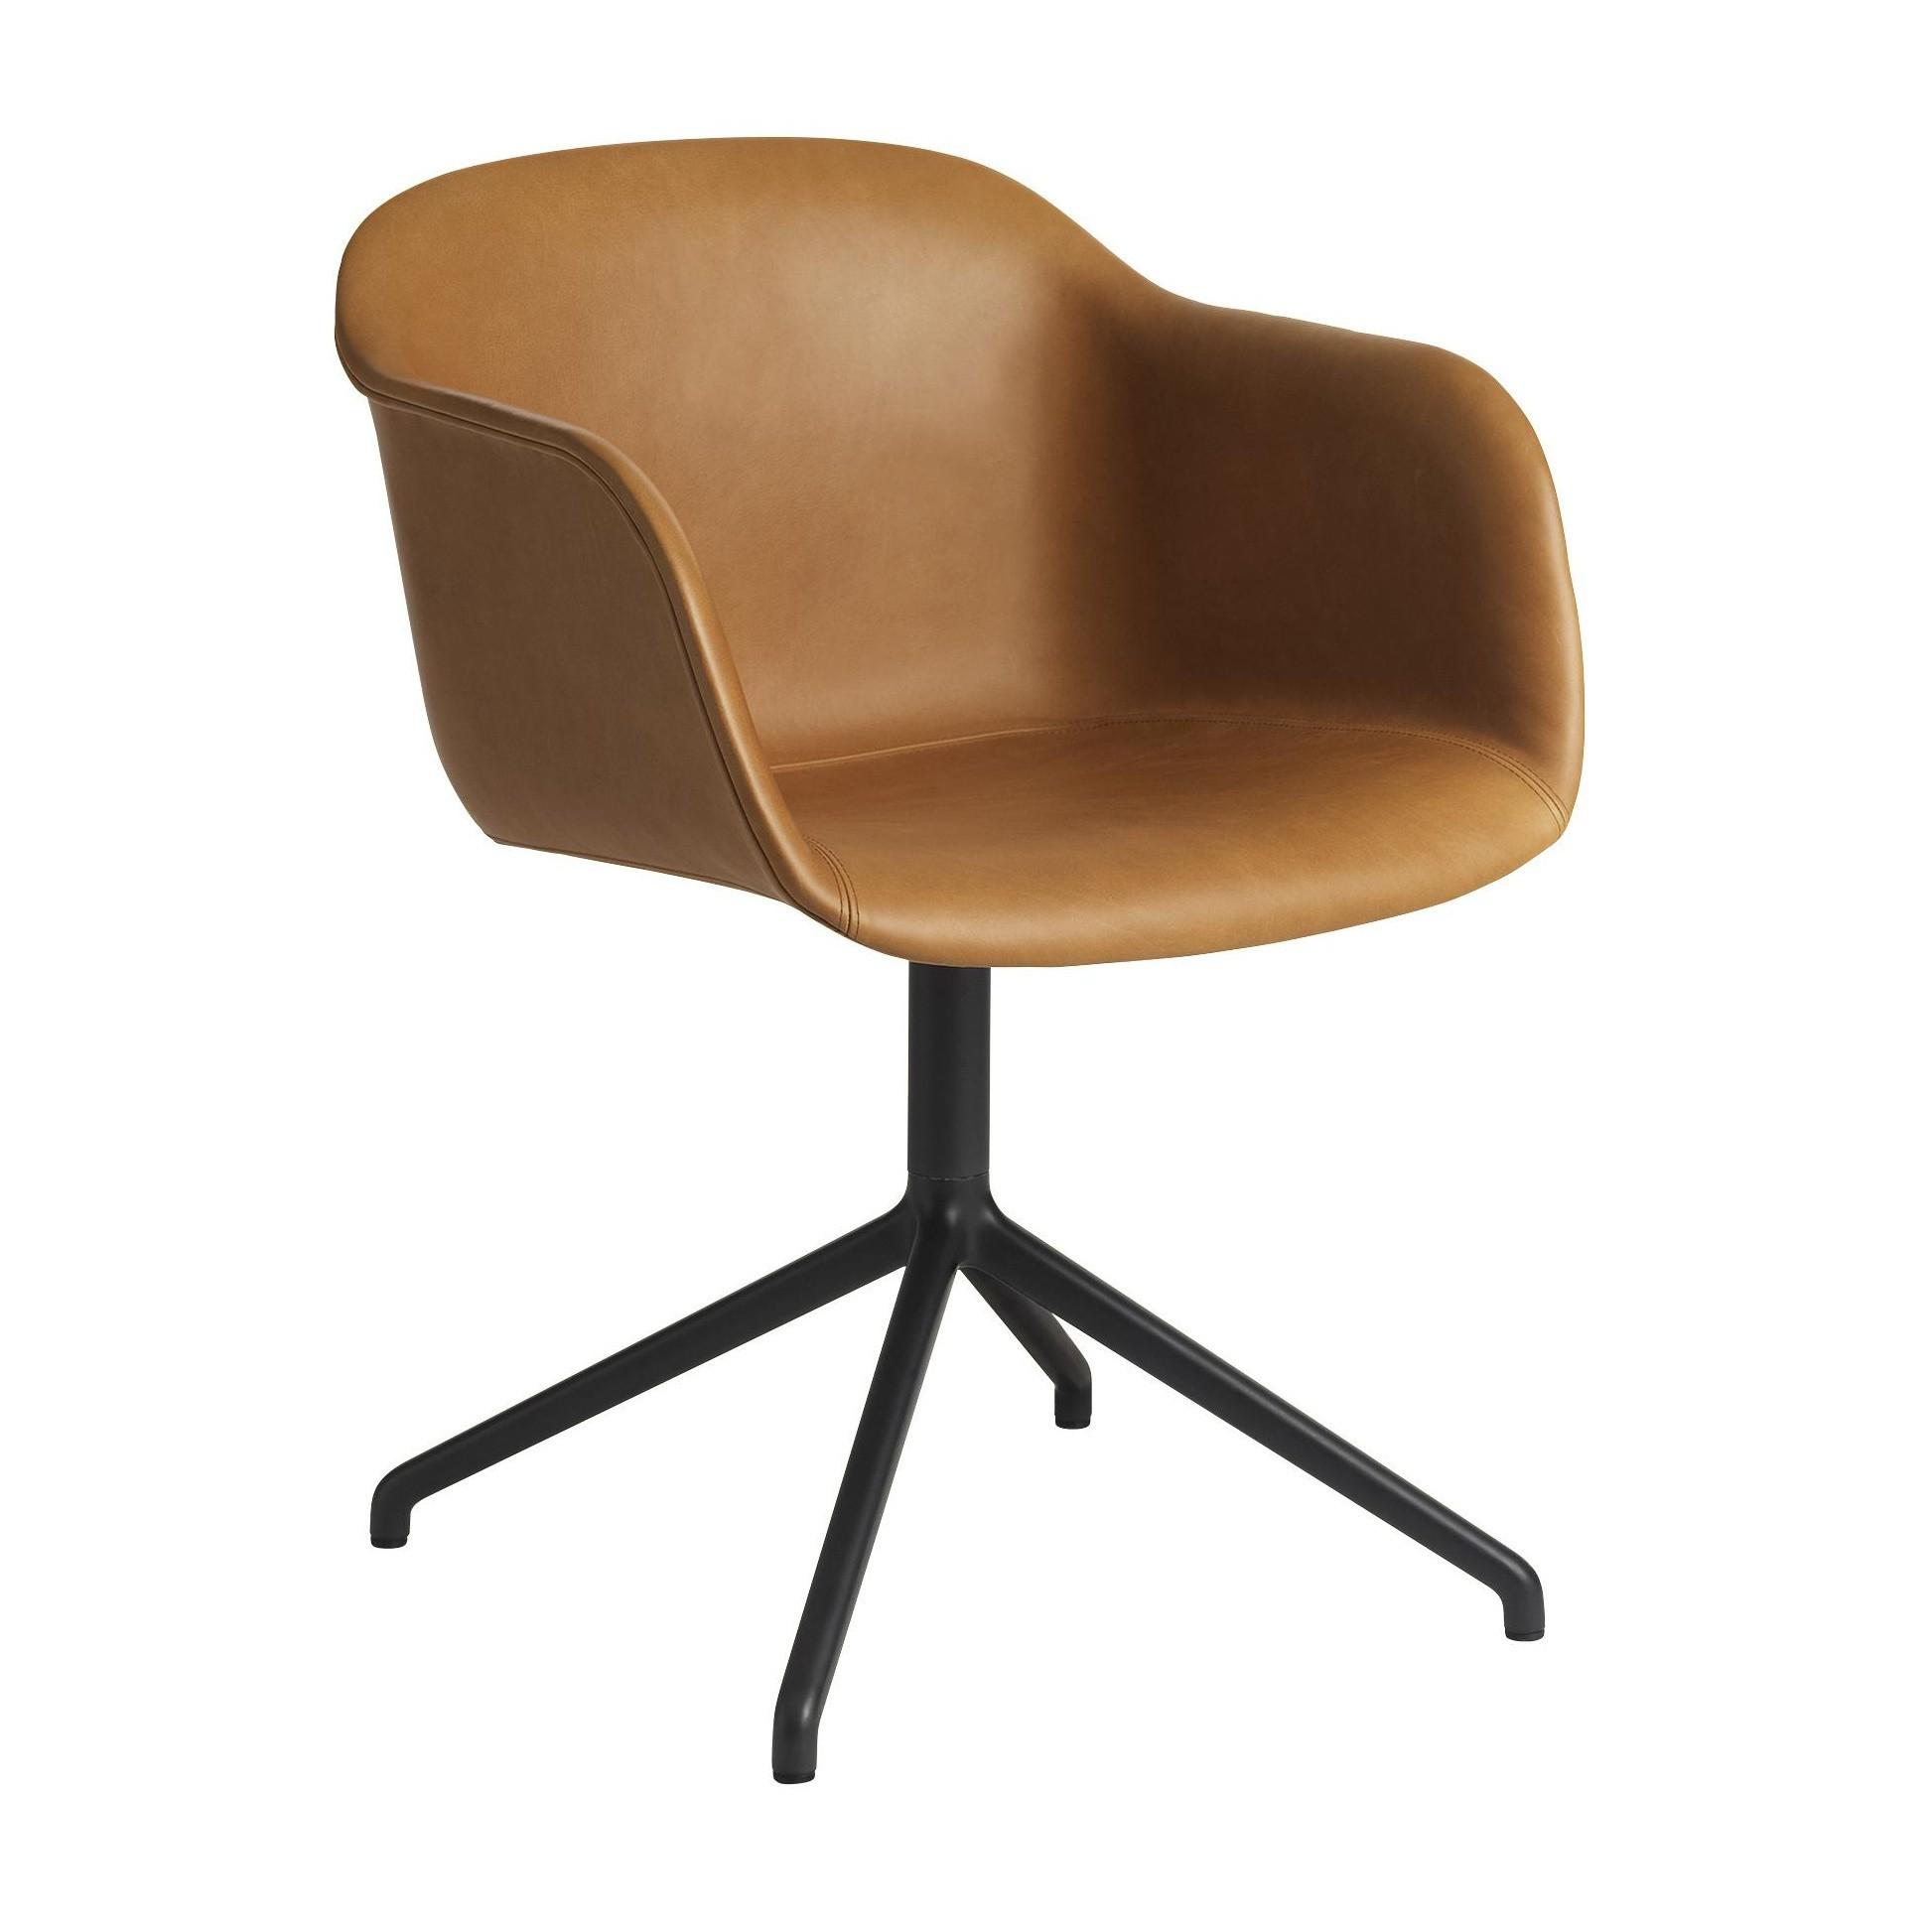 Miraculous Fiber Armchair Swivel Base Full Upholstered Beatyapartments Chair Design Images Beatyapartmentscom